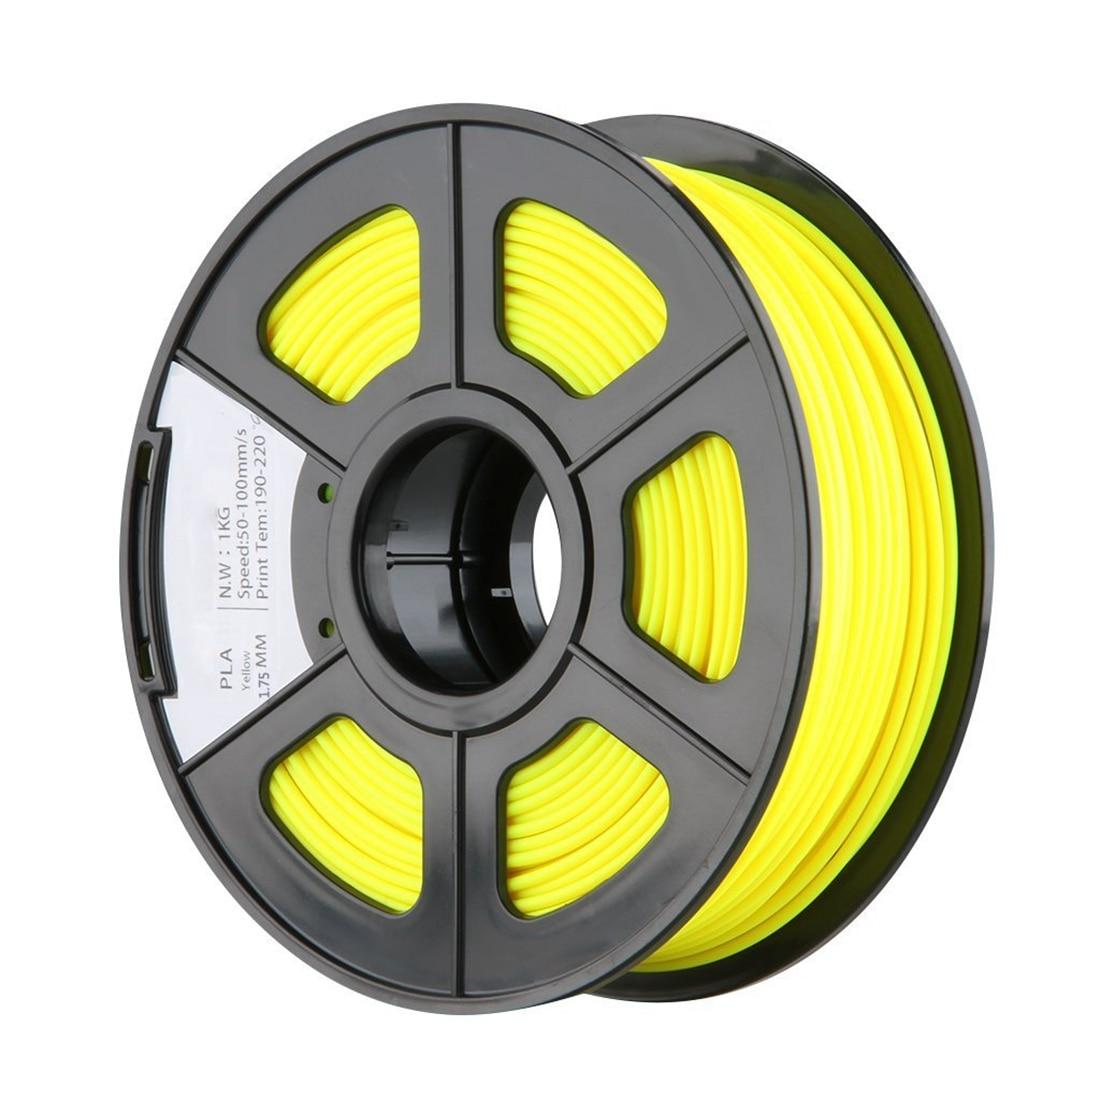 New 1.75mm PLA 3D Printer Filament - 1kg Spool (2.2 lbs) - Dimensional Accuracy +/- 0.02mm - Multi Colors Available (Yellow)  biqu new spool filament mount rack bracket for pla abs filament 3d printer